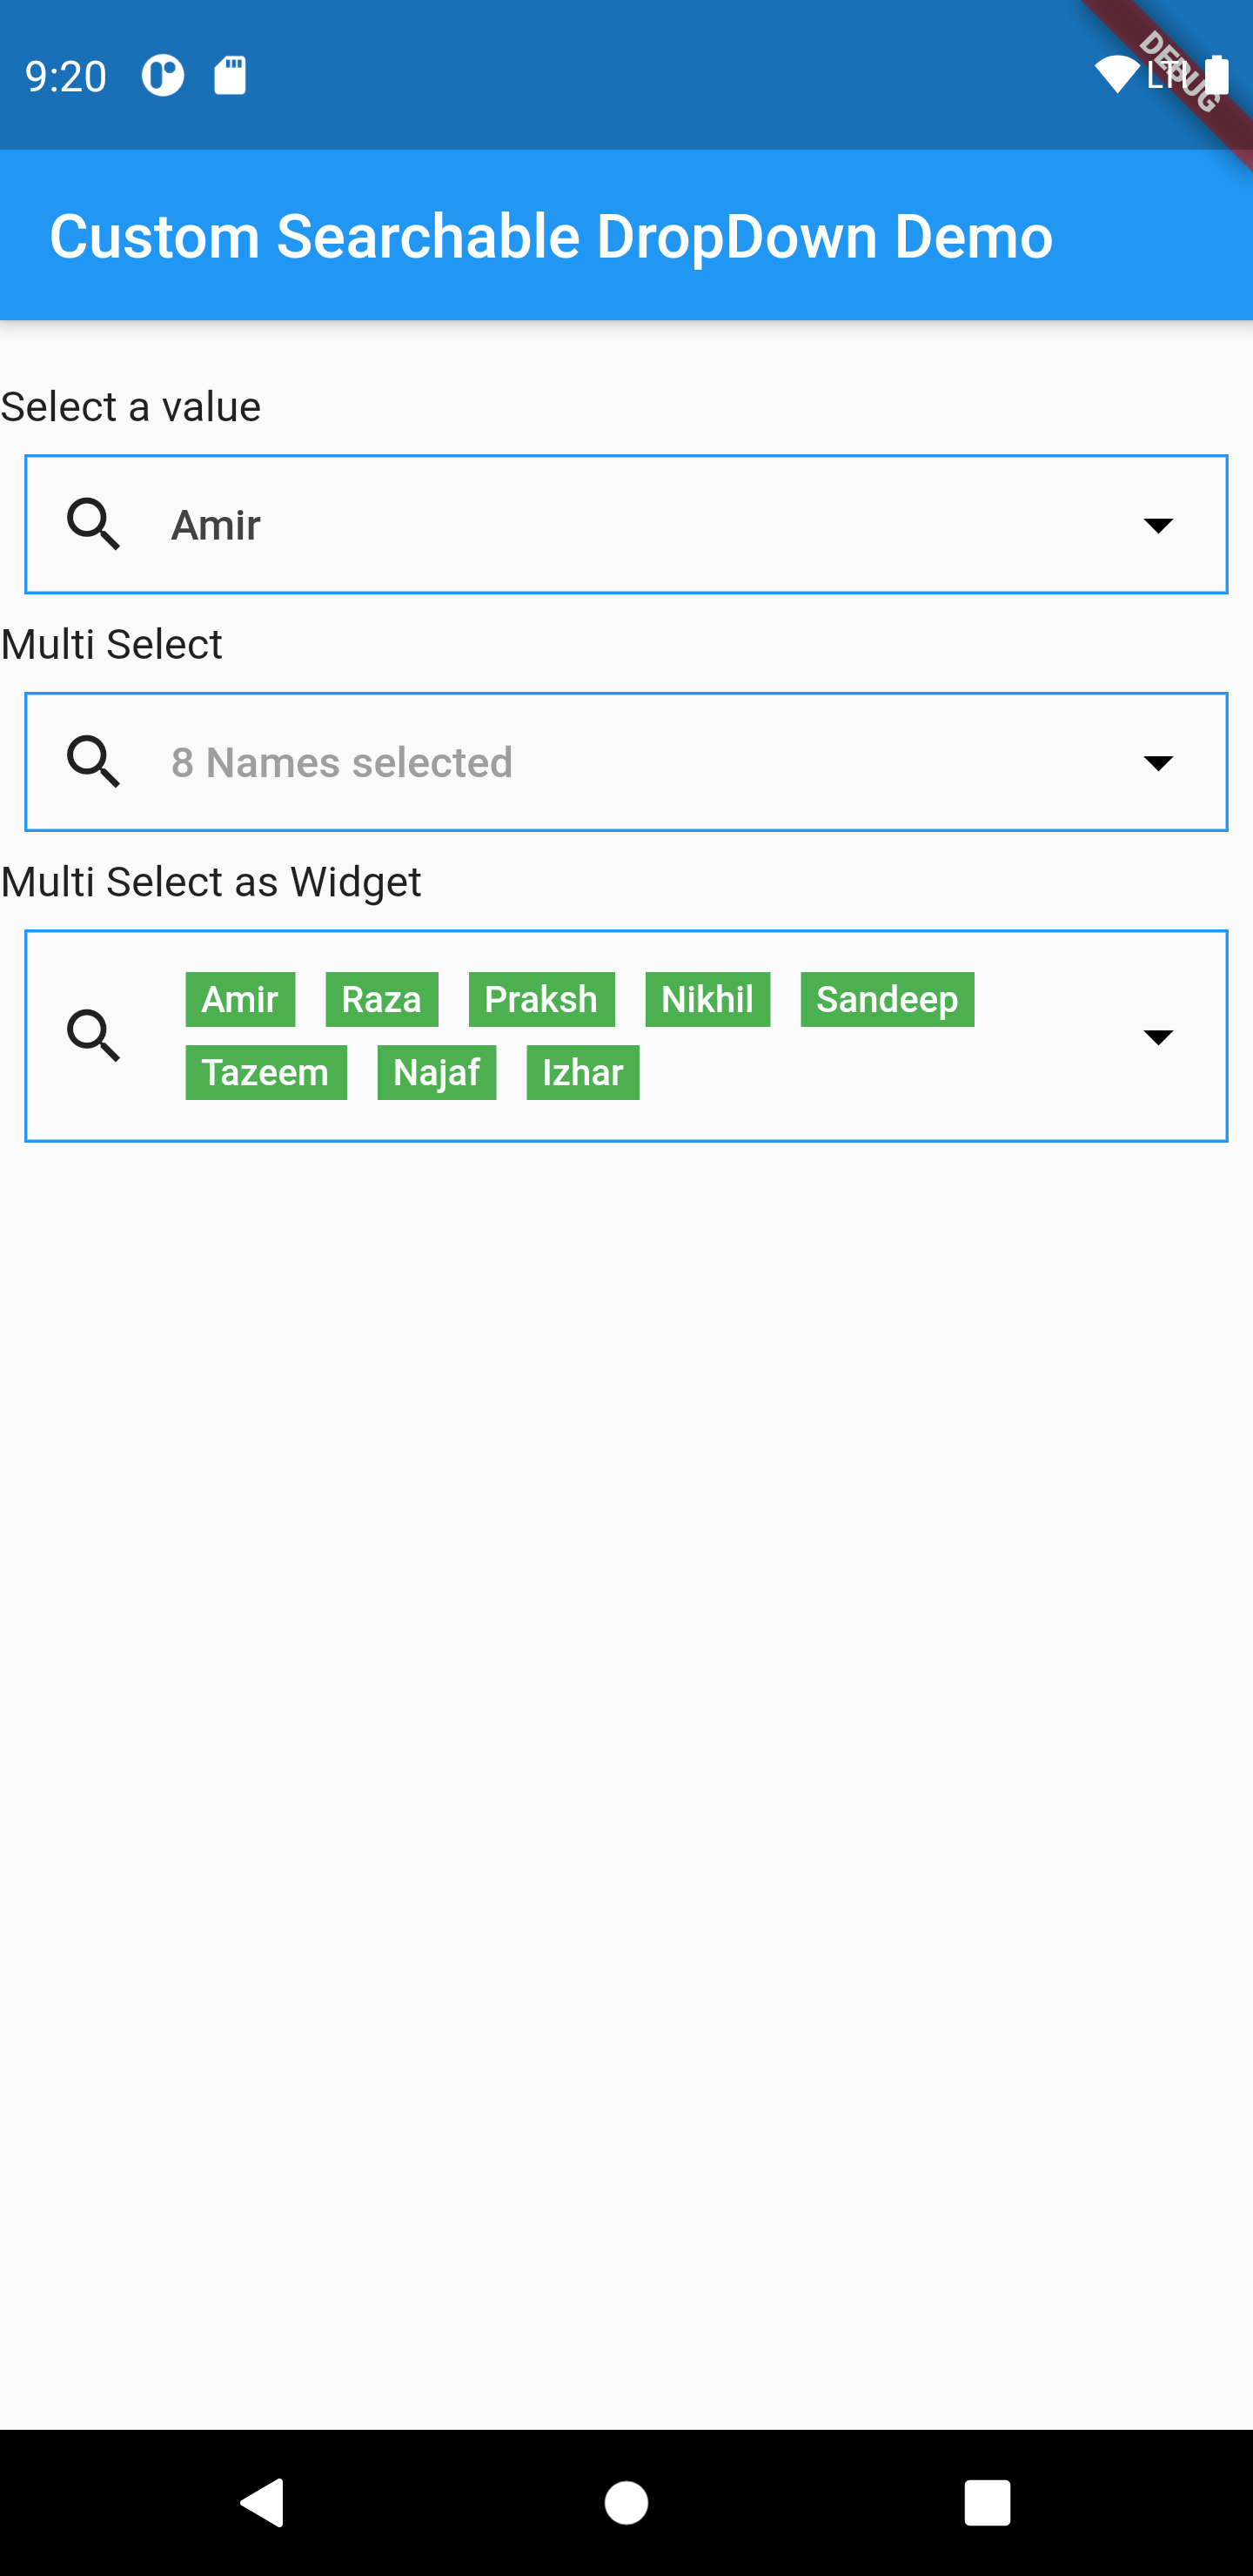 MultiSelect DropDown